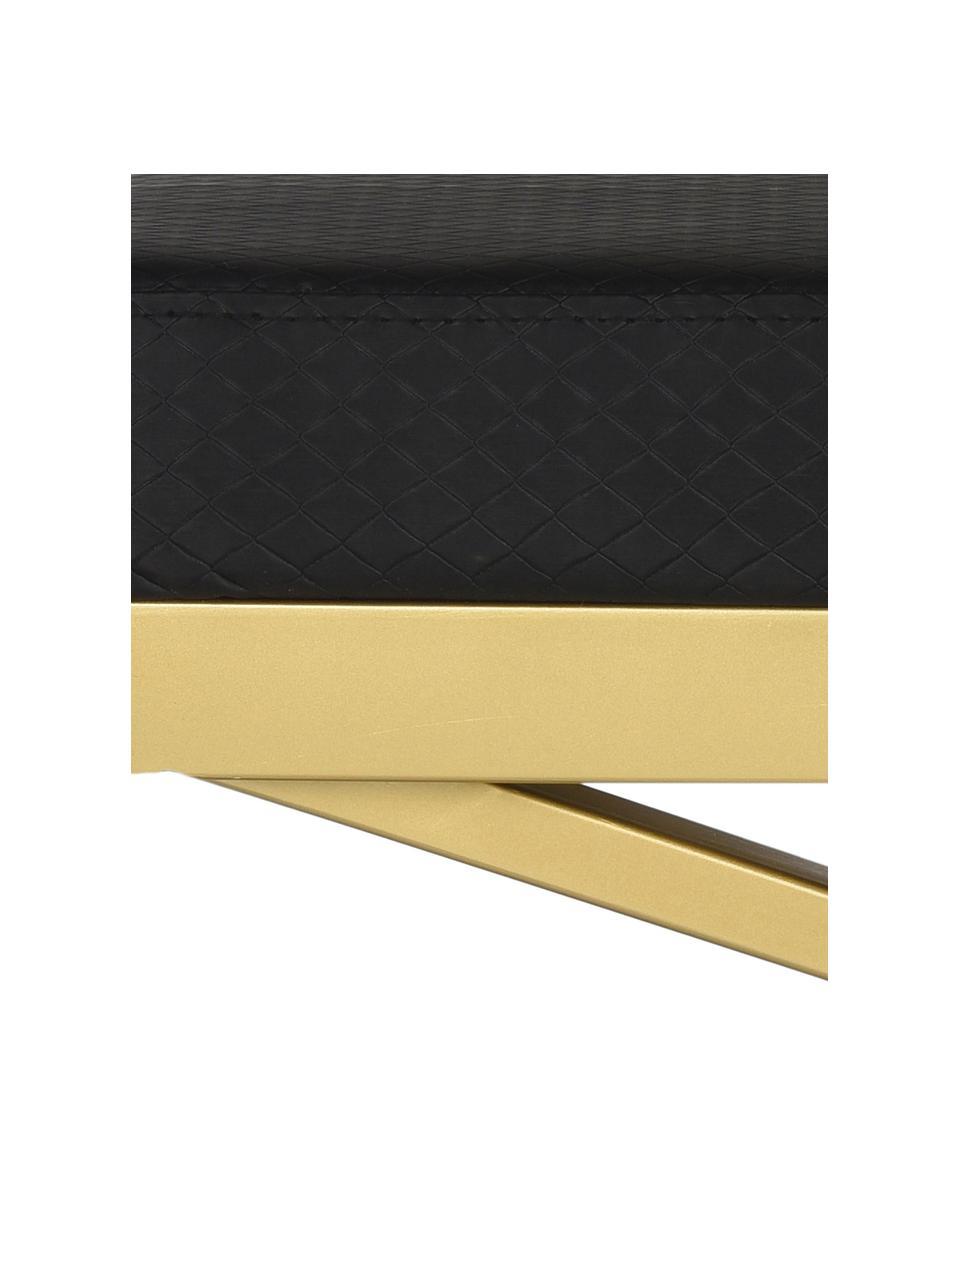 Panca in similpelle Susan, Struttura: acciaio verniciato, Rivestimento: similpelle (poliuretano) , Nero, dorato, Larg. 109 x Alt. 46 cm